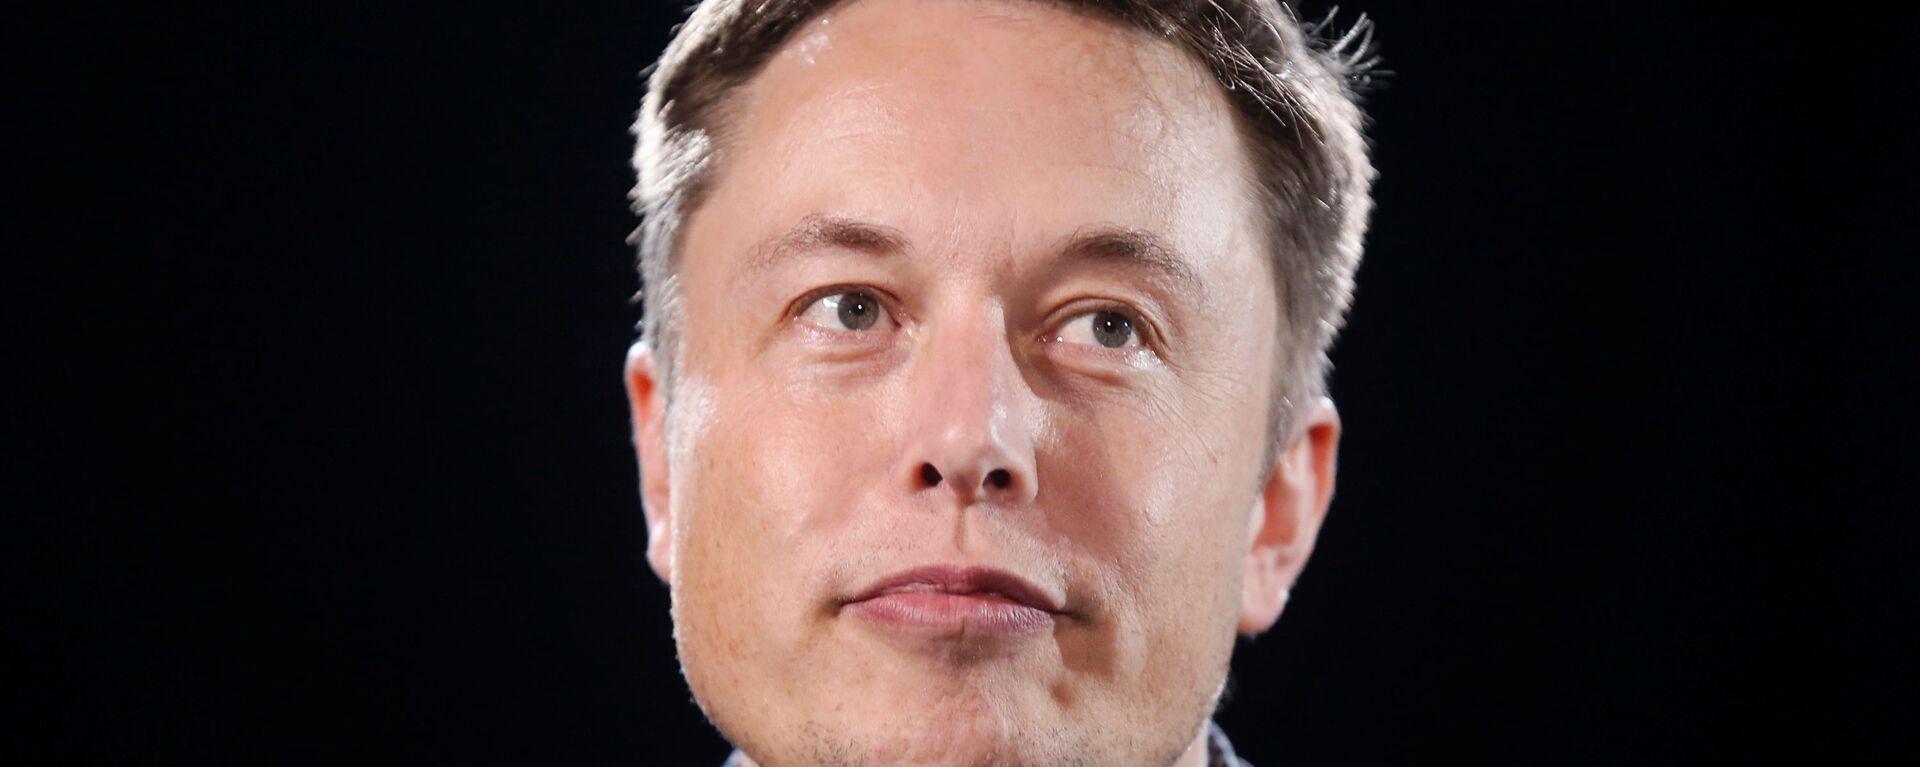 Elon Musk, director general de Tesla y SpaceX - Sputnik Mundo, 1920, 15.06.2021